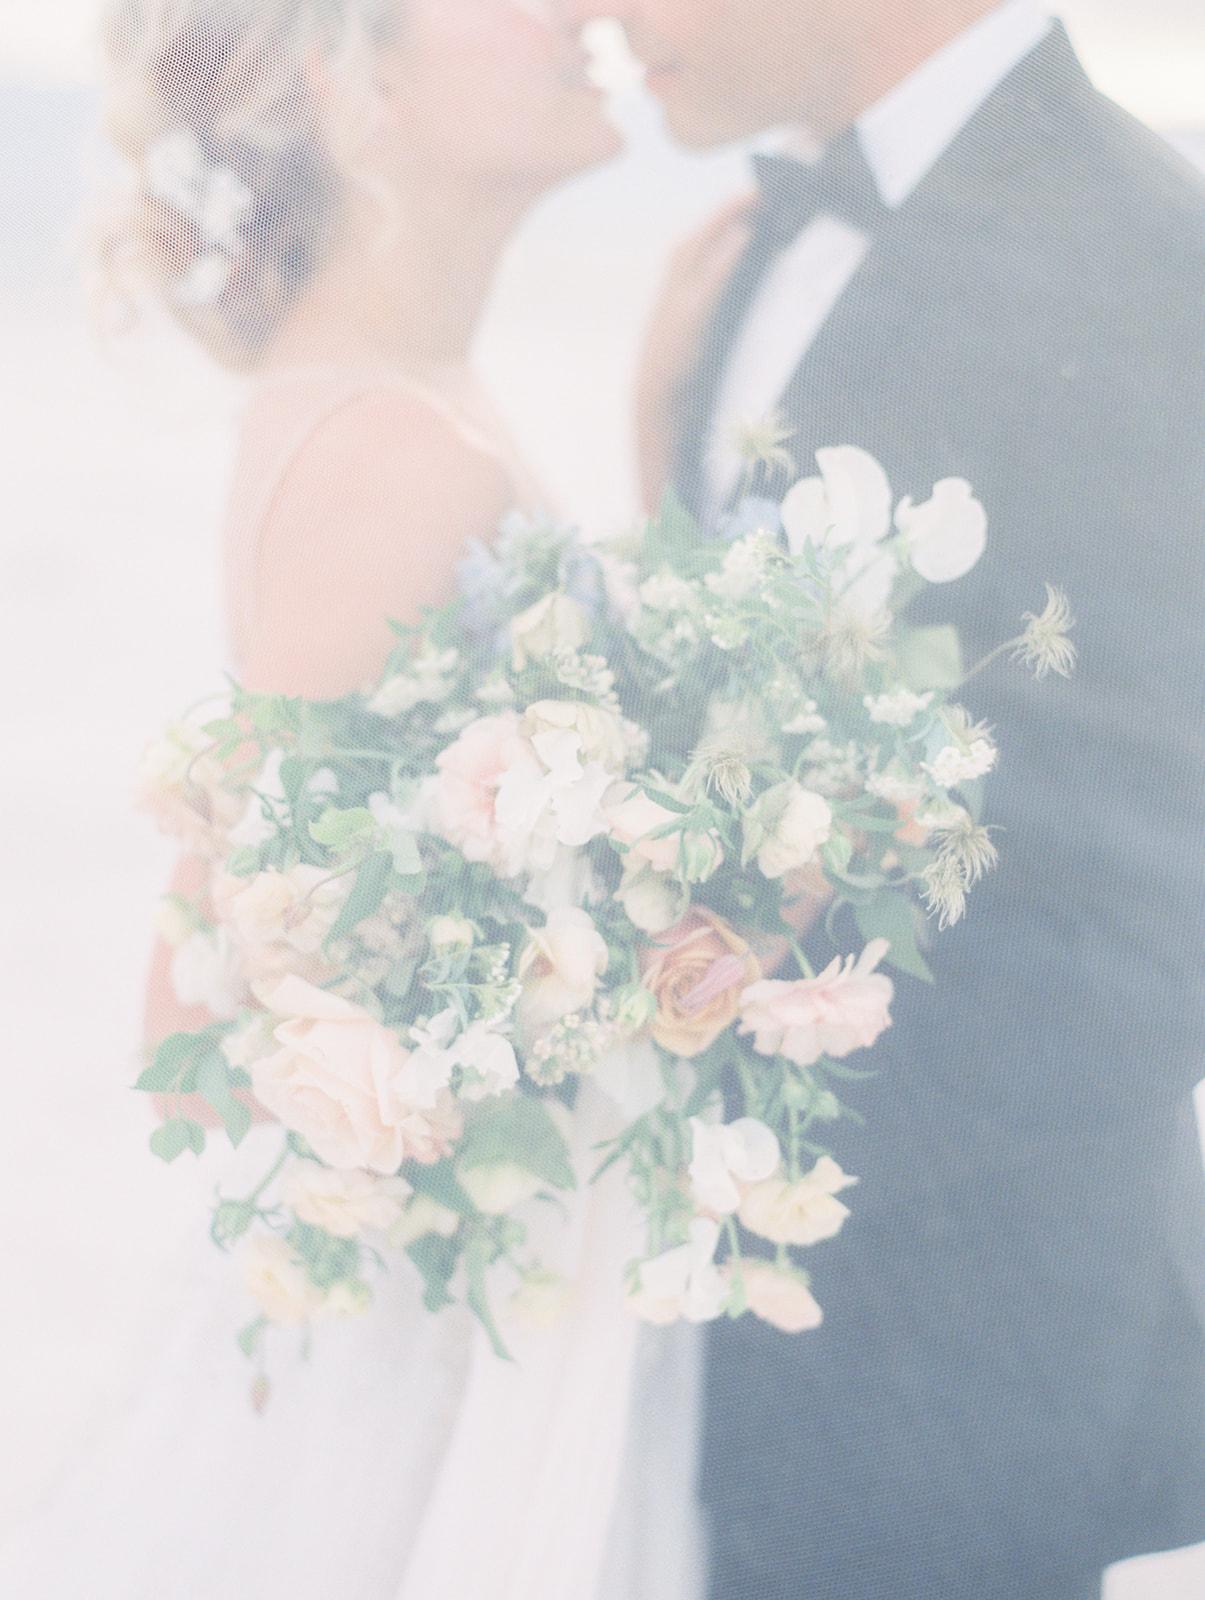 Soft veil for this wedding inspo